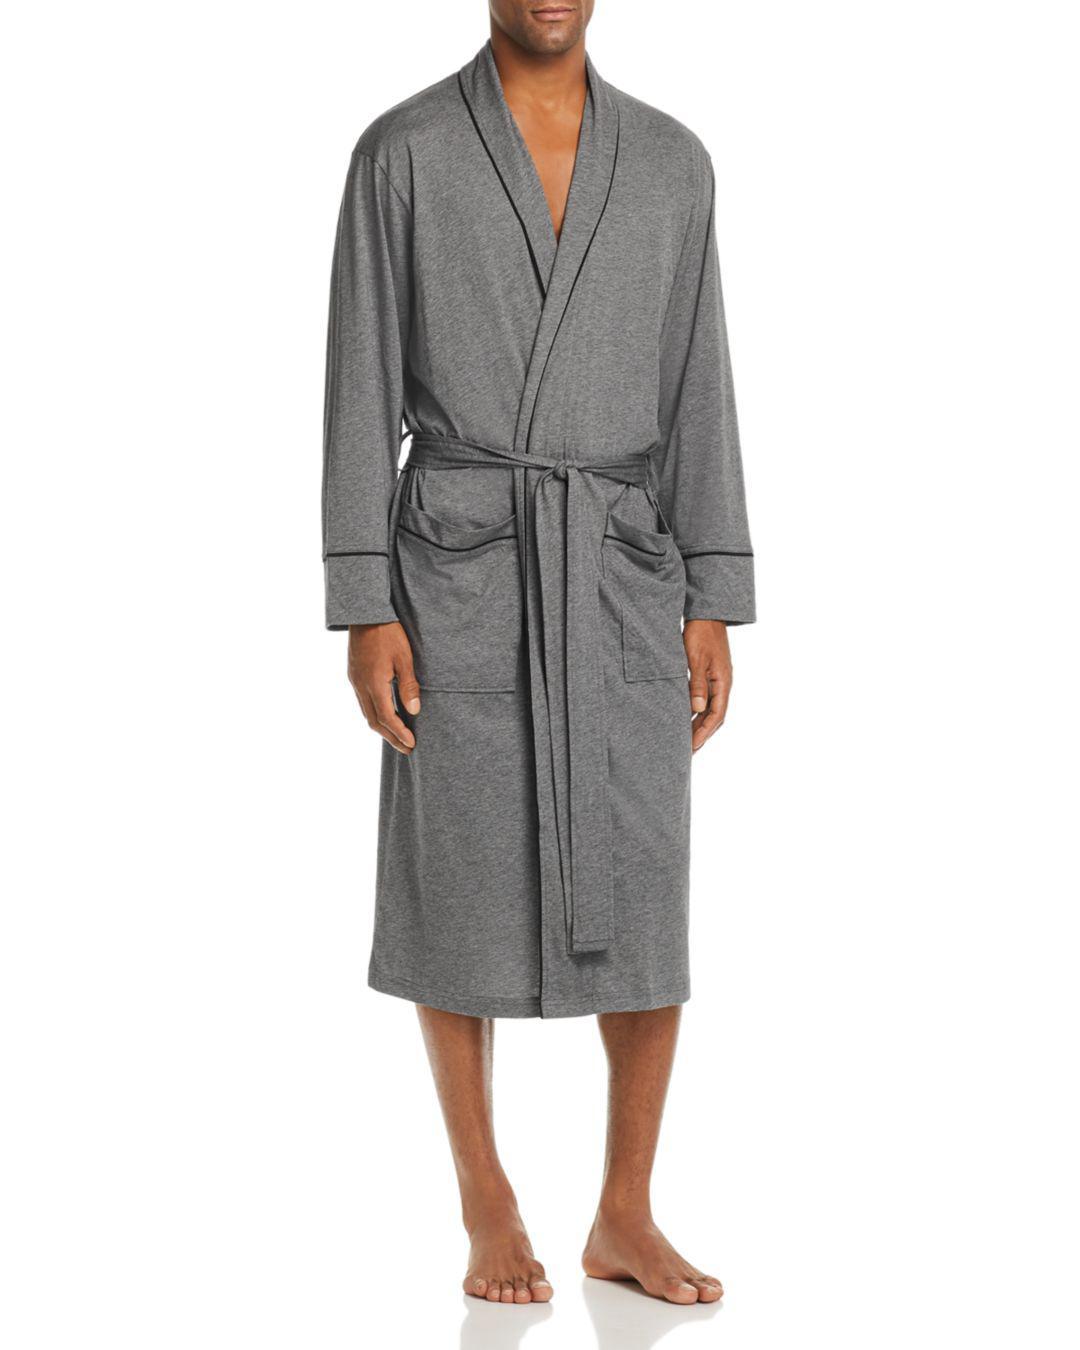 Daniel Buchler Contrast-piped Cotton Robe in Gray for Men - Lyst 1404420e3